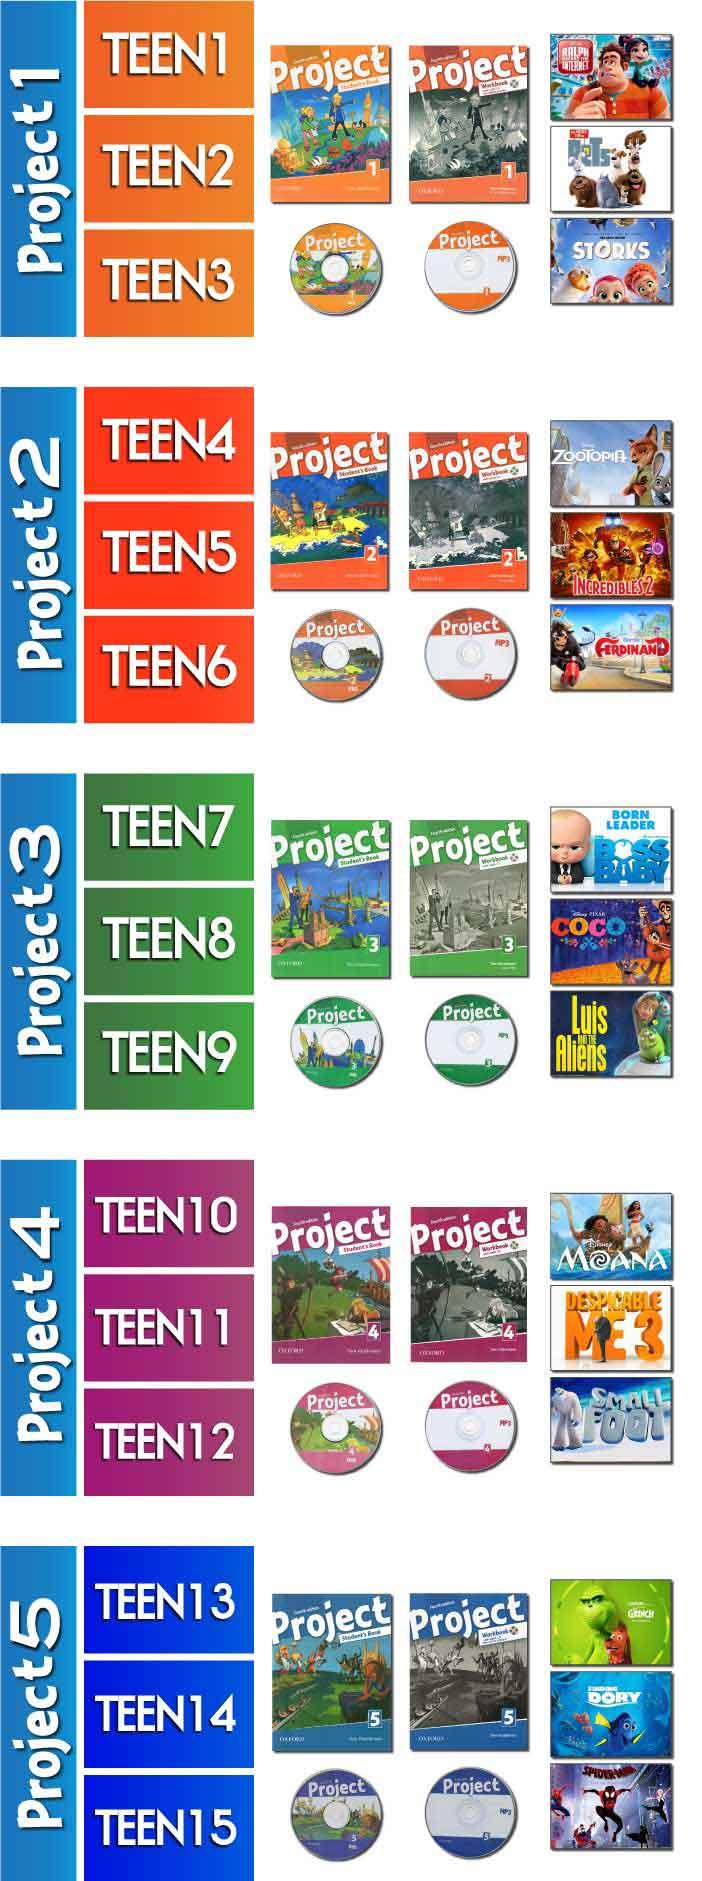 کتاب زبان نوجوانان PROJECT